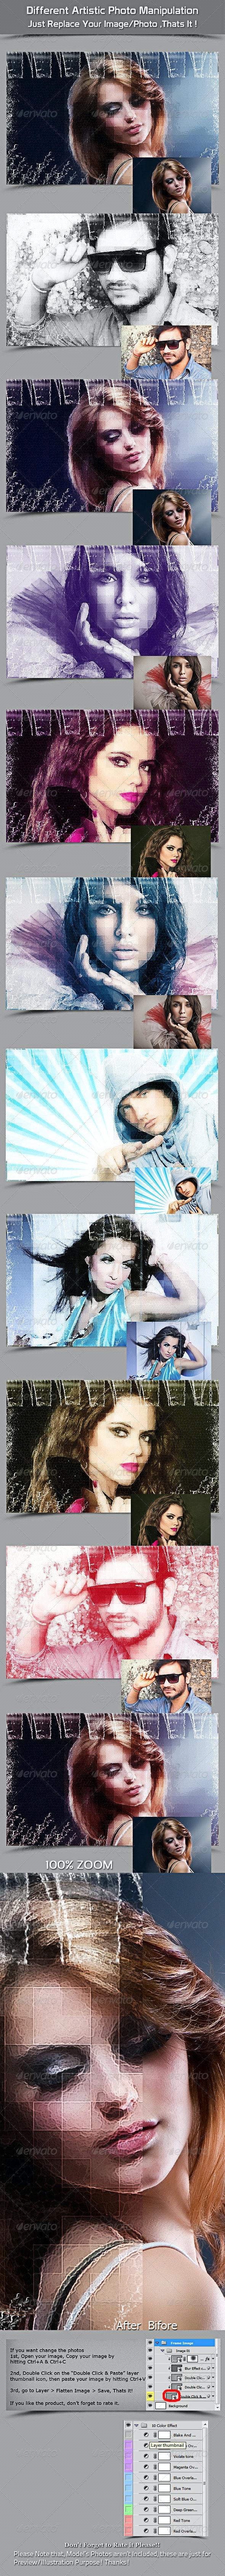 Different Artistic Photo Manipulation - Photo Templates Graphics